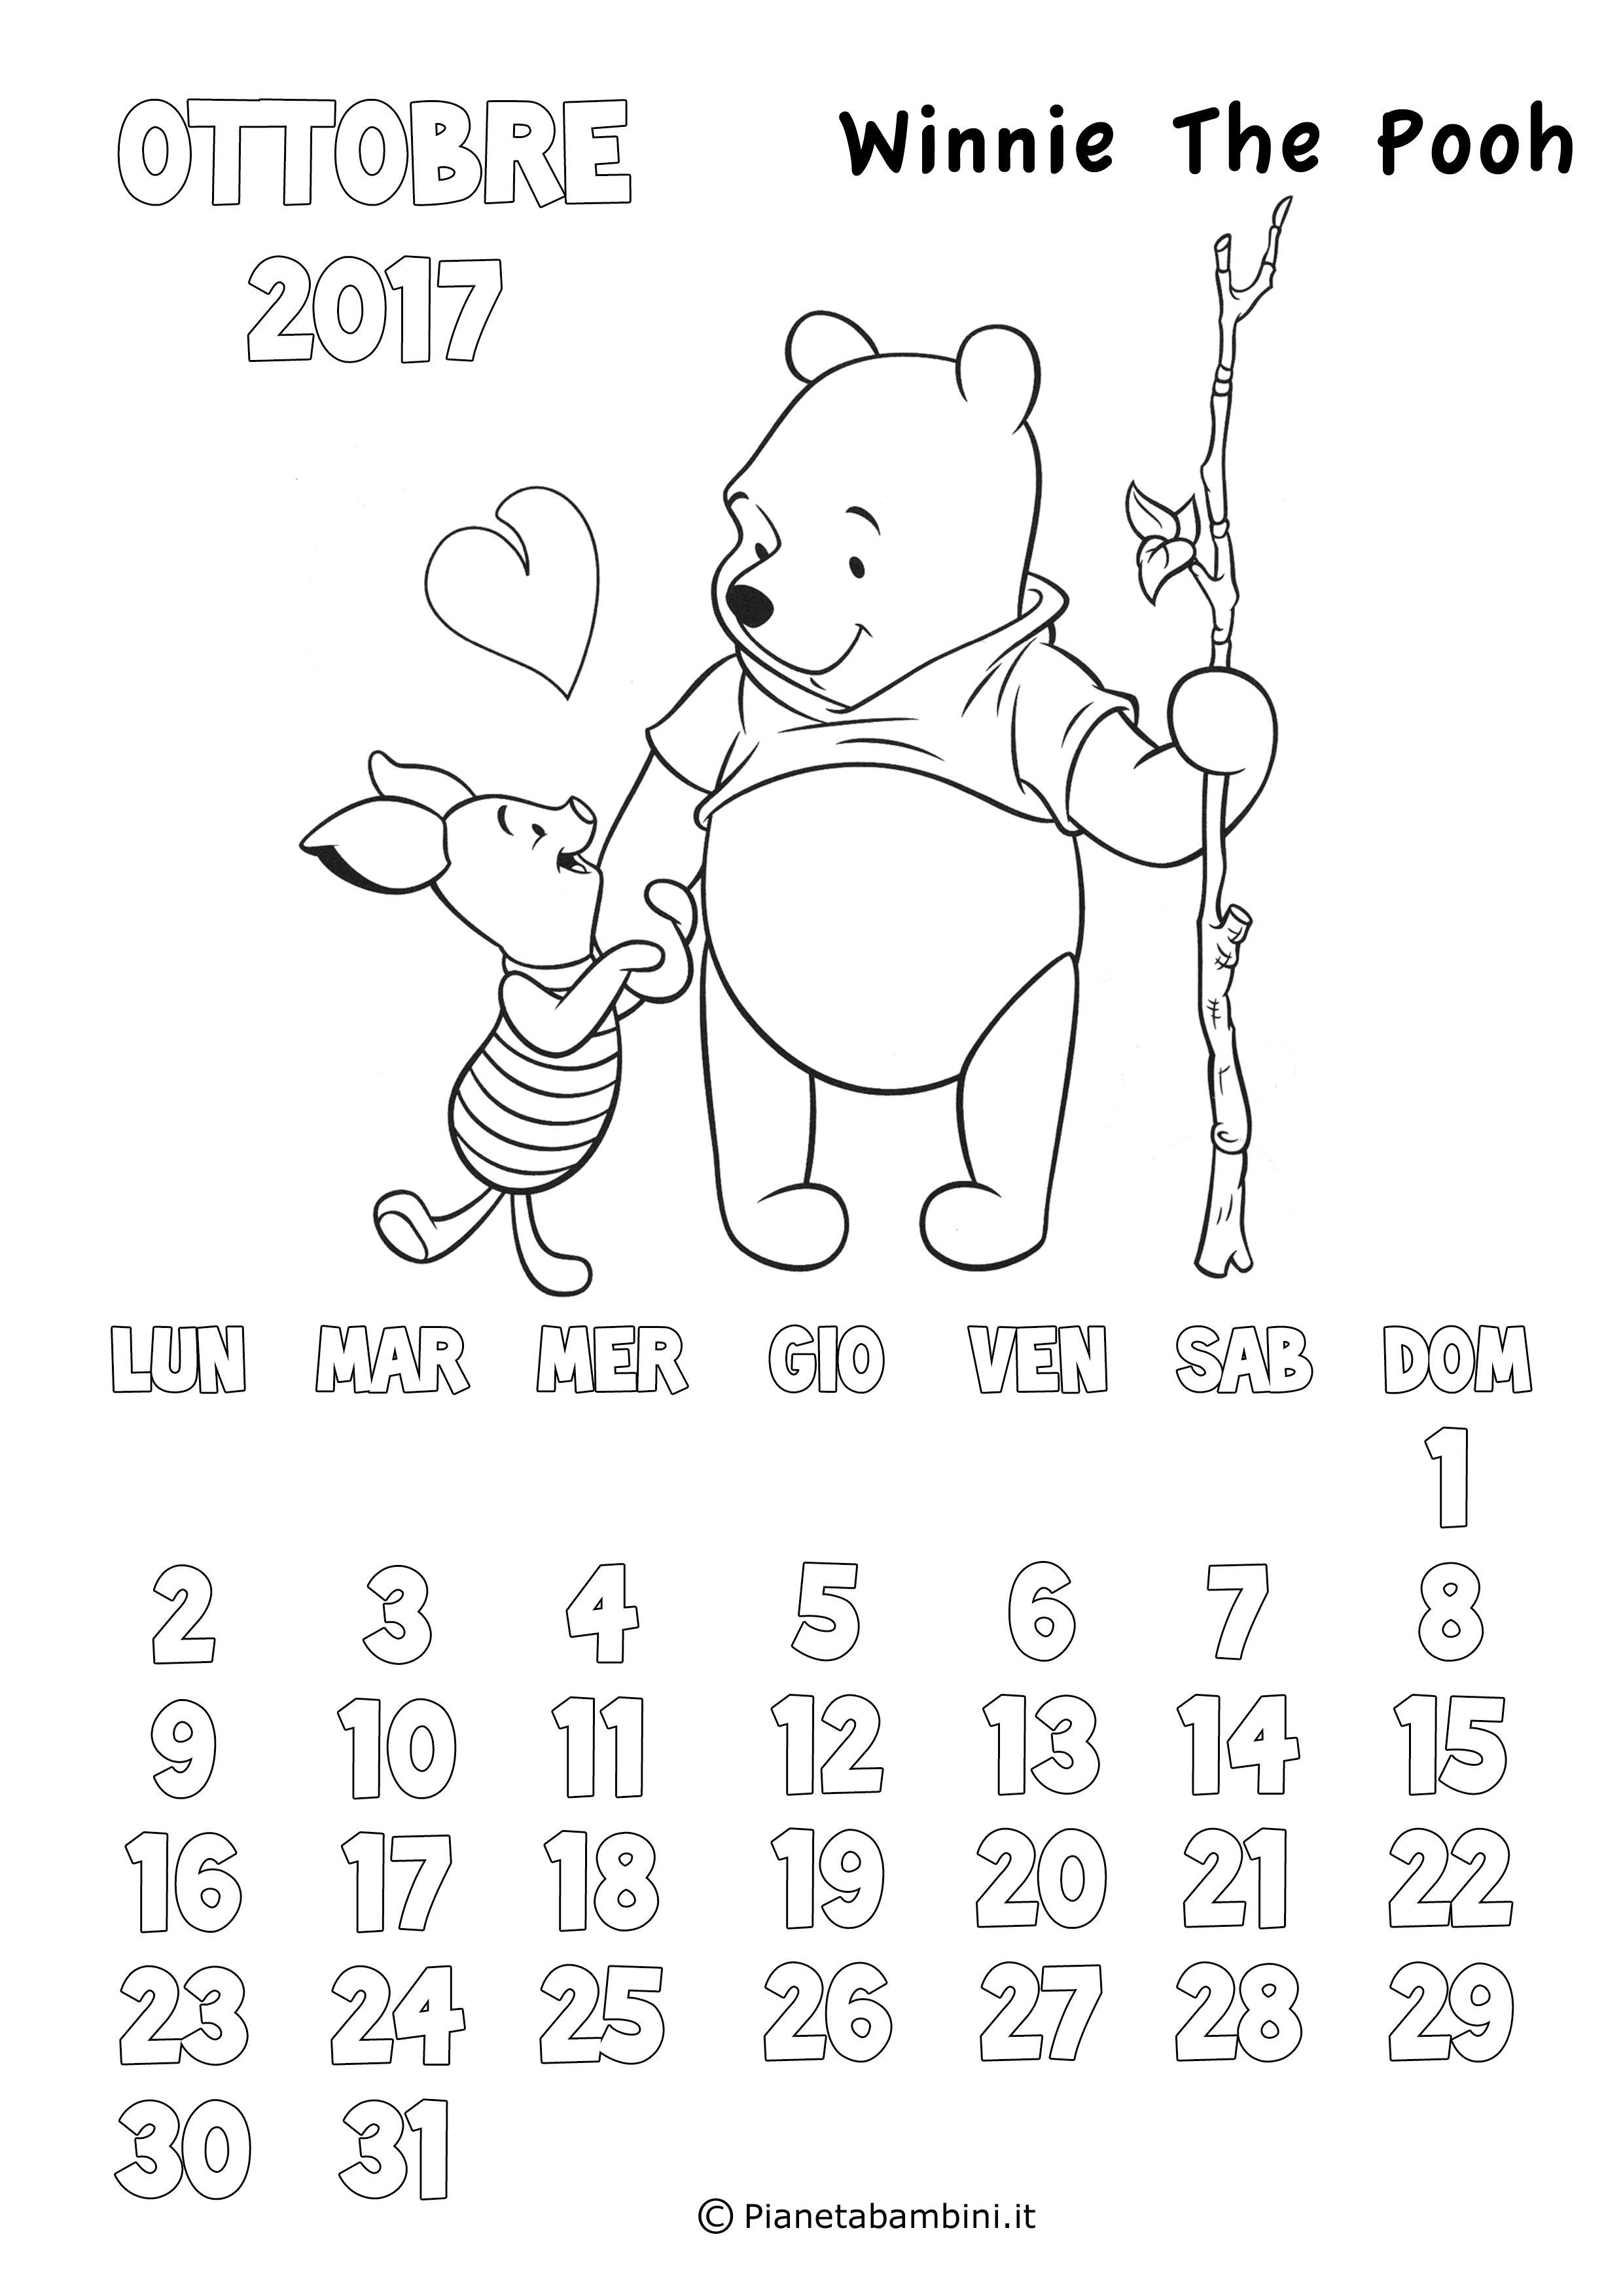 ottobre-2017-winnie-pooh